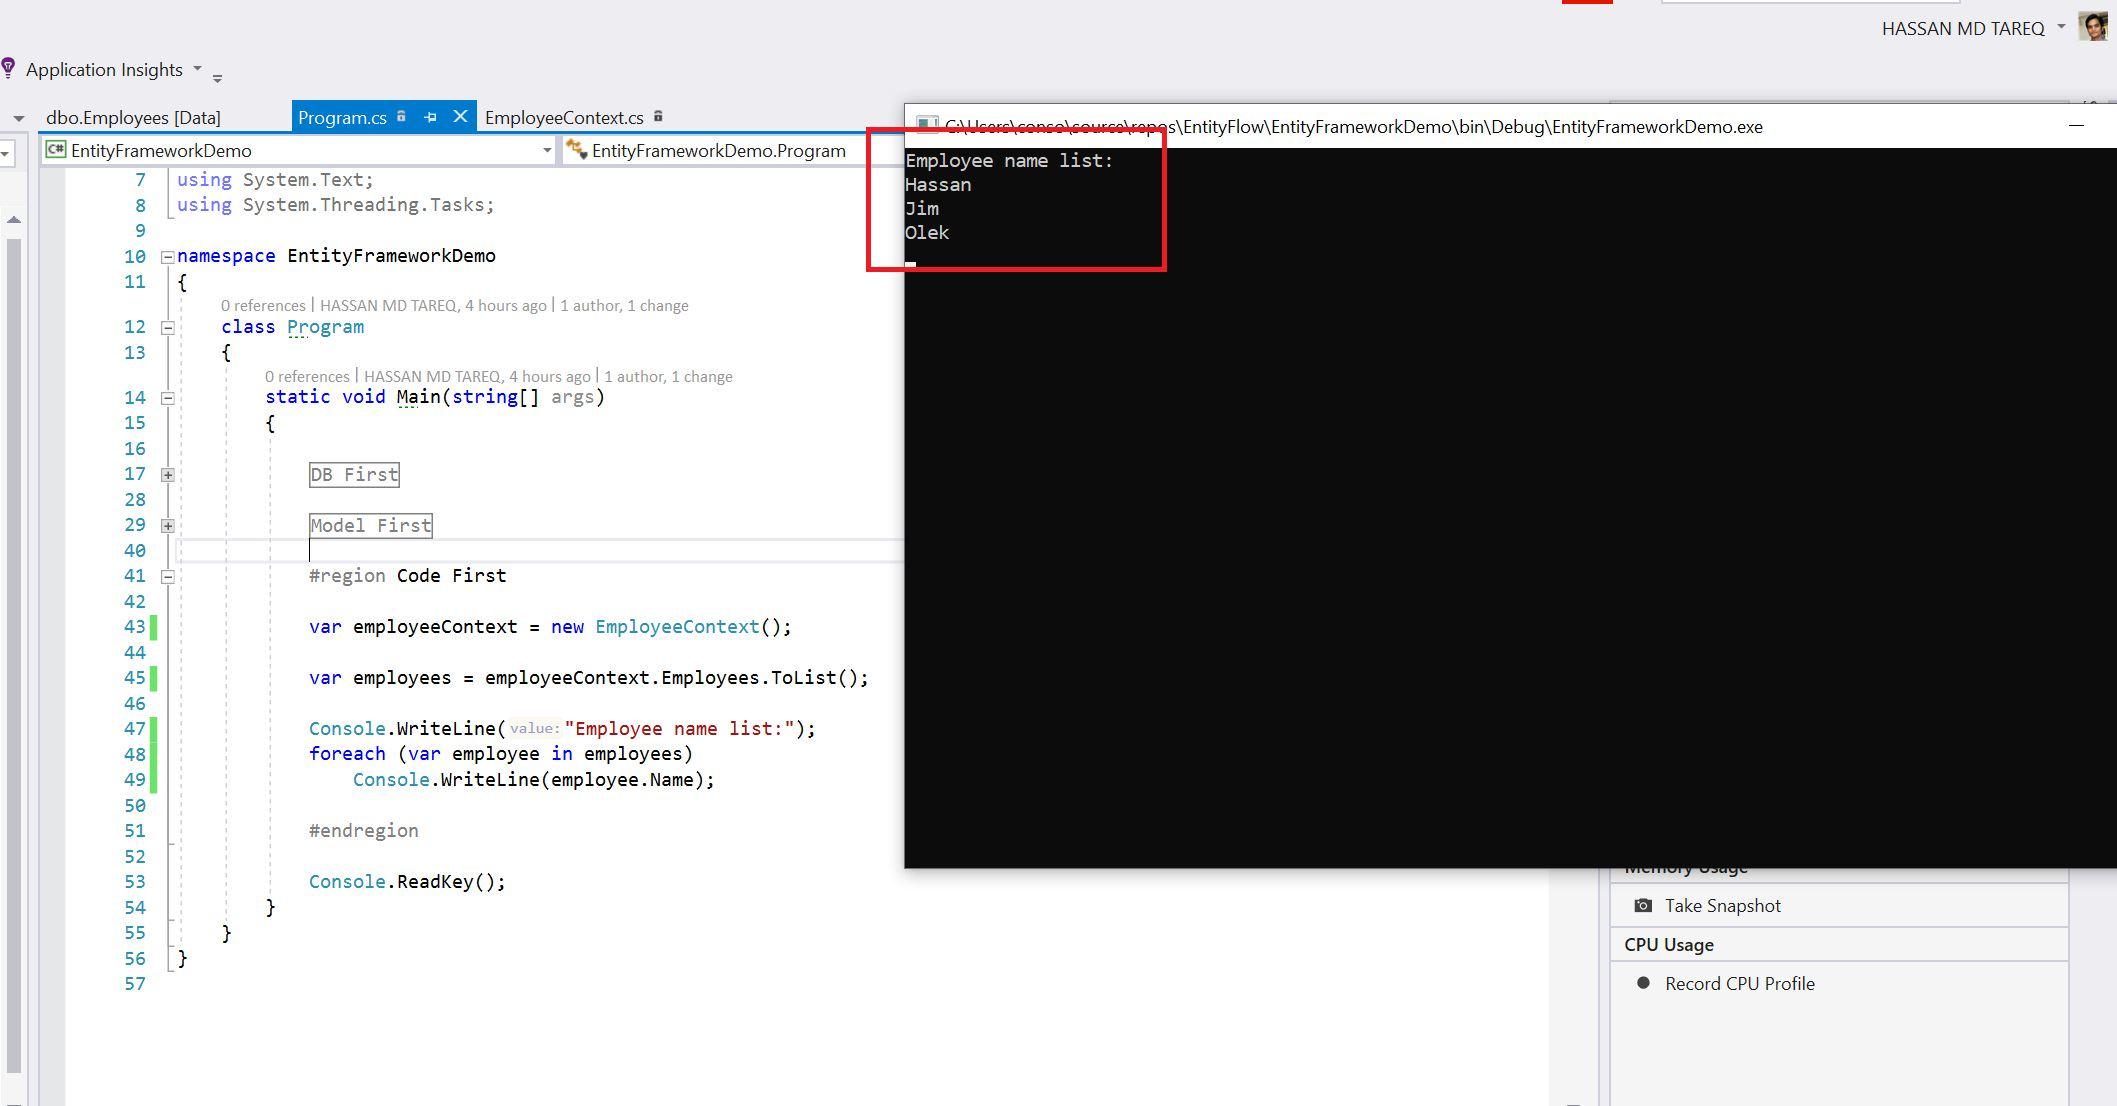 Entity Framework Code Fisrt Approach - Creating edmx from DbContext Step 23